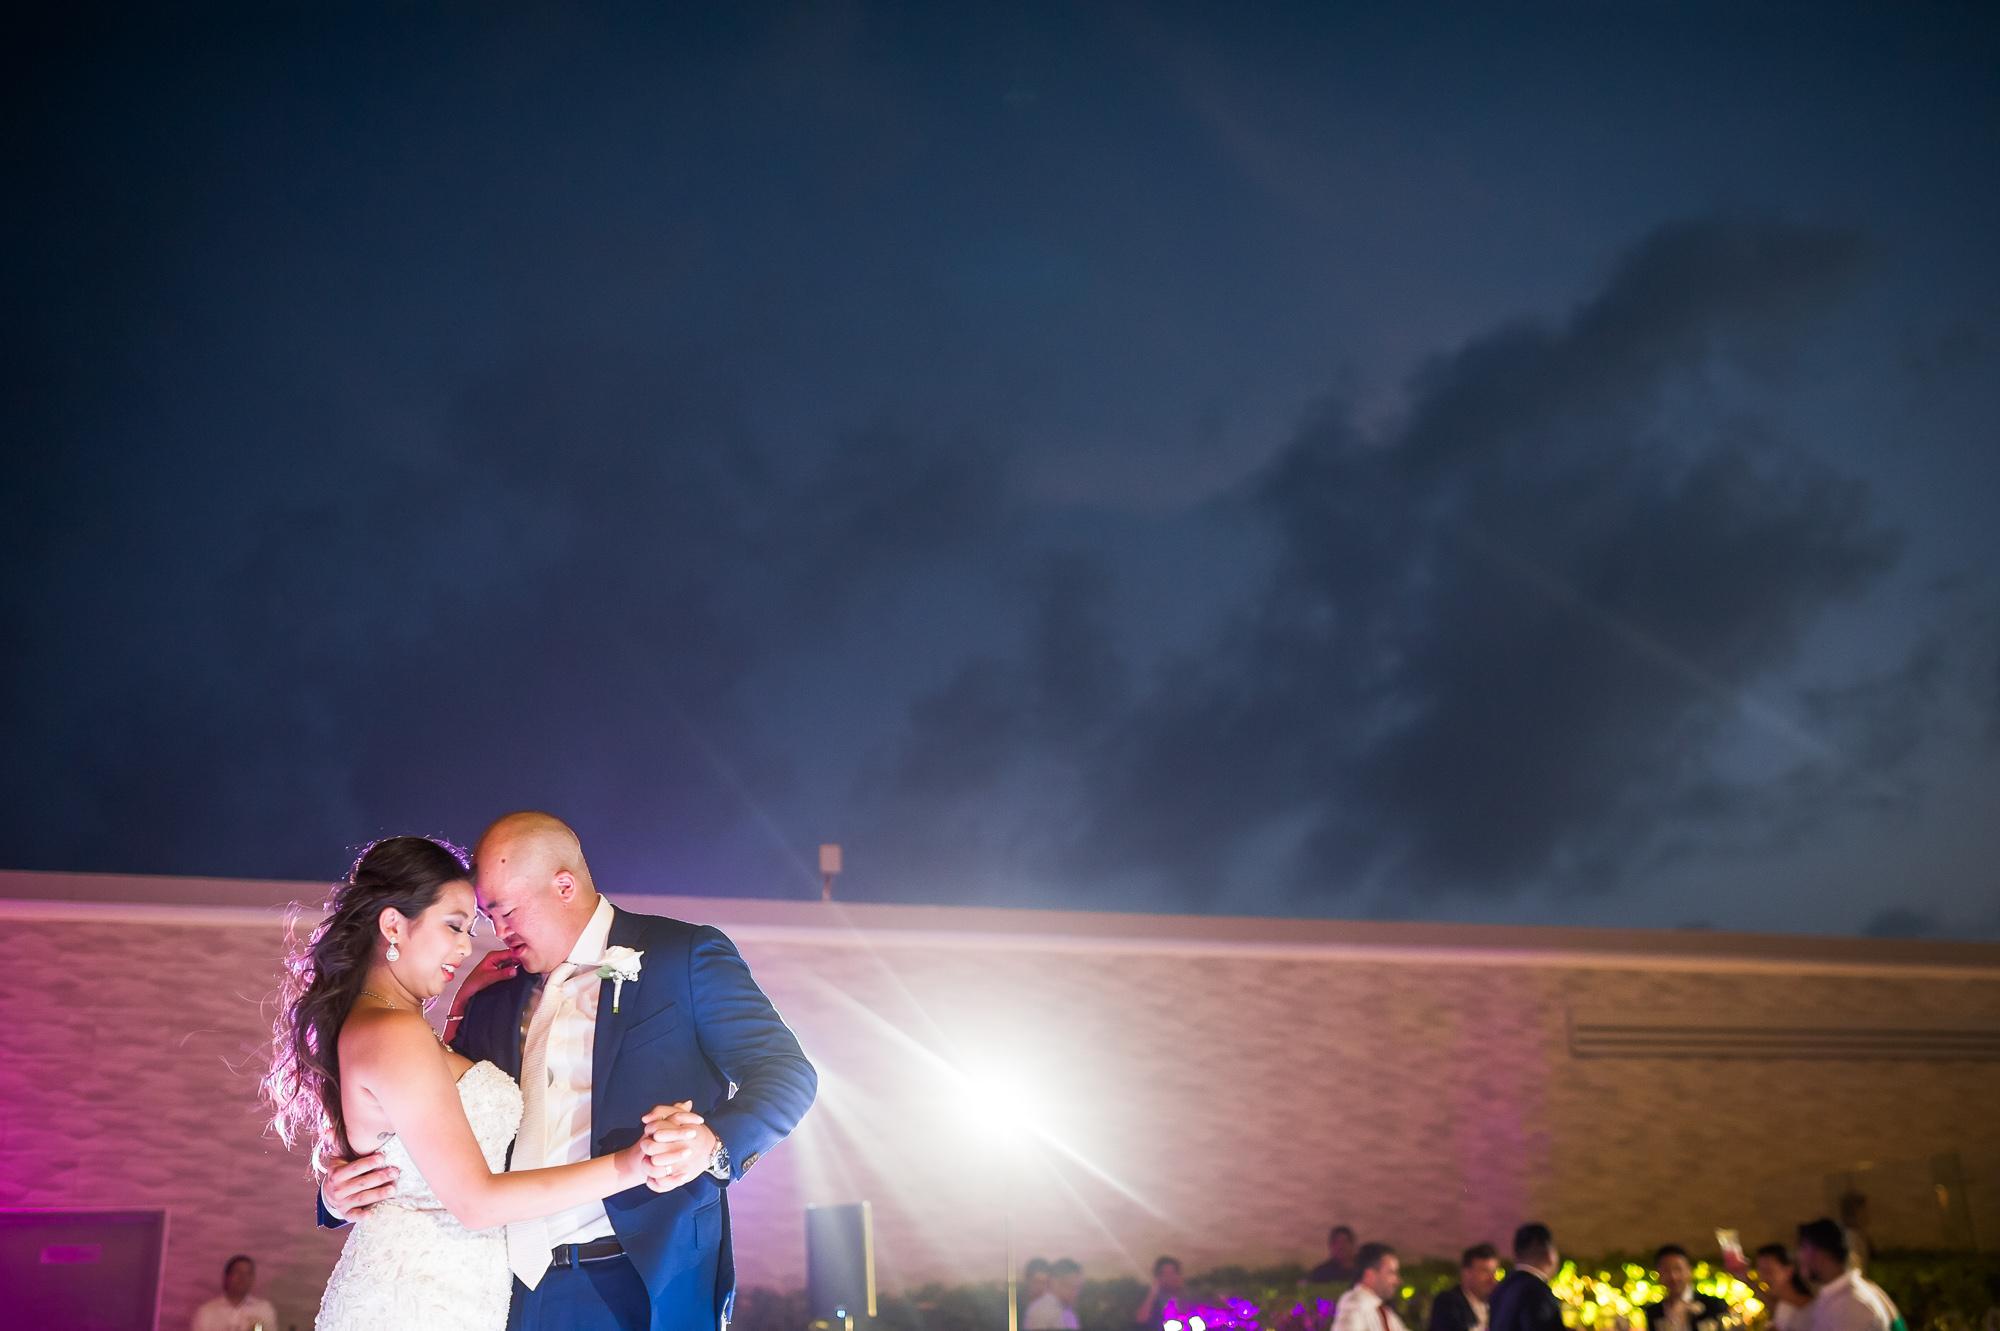 36-David Loi Studios - Cancun - Mexico - Destination Wedding-25843.jpg